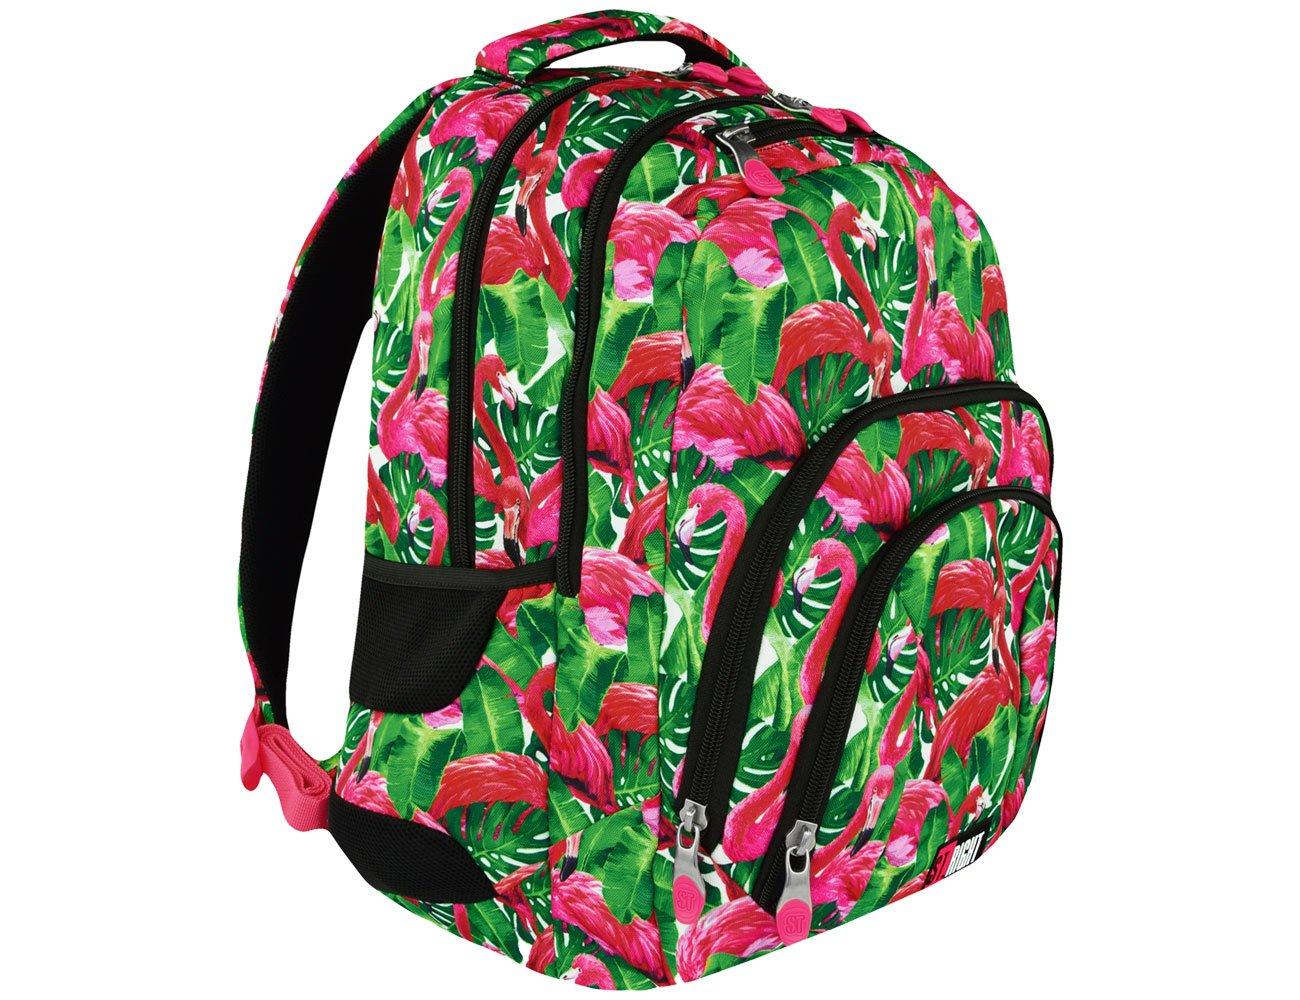 Majewski ST.Right Plecak szkolny Flamingo Green BP-25 5903235618611